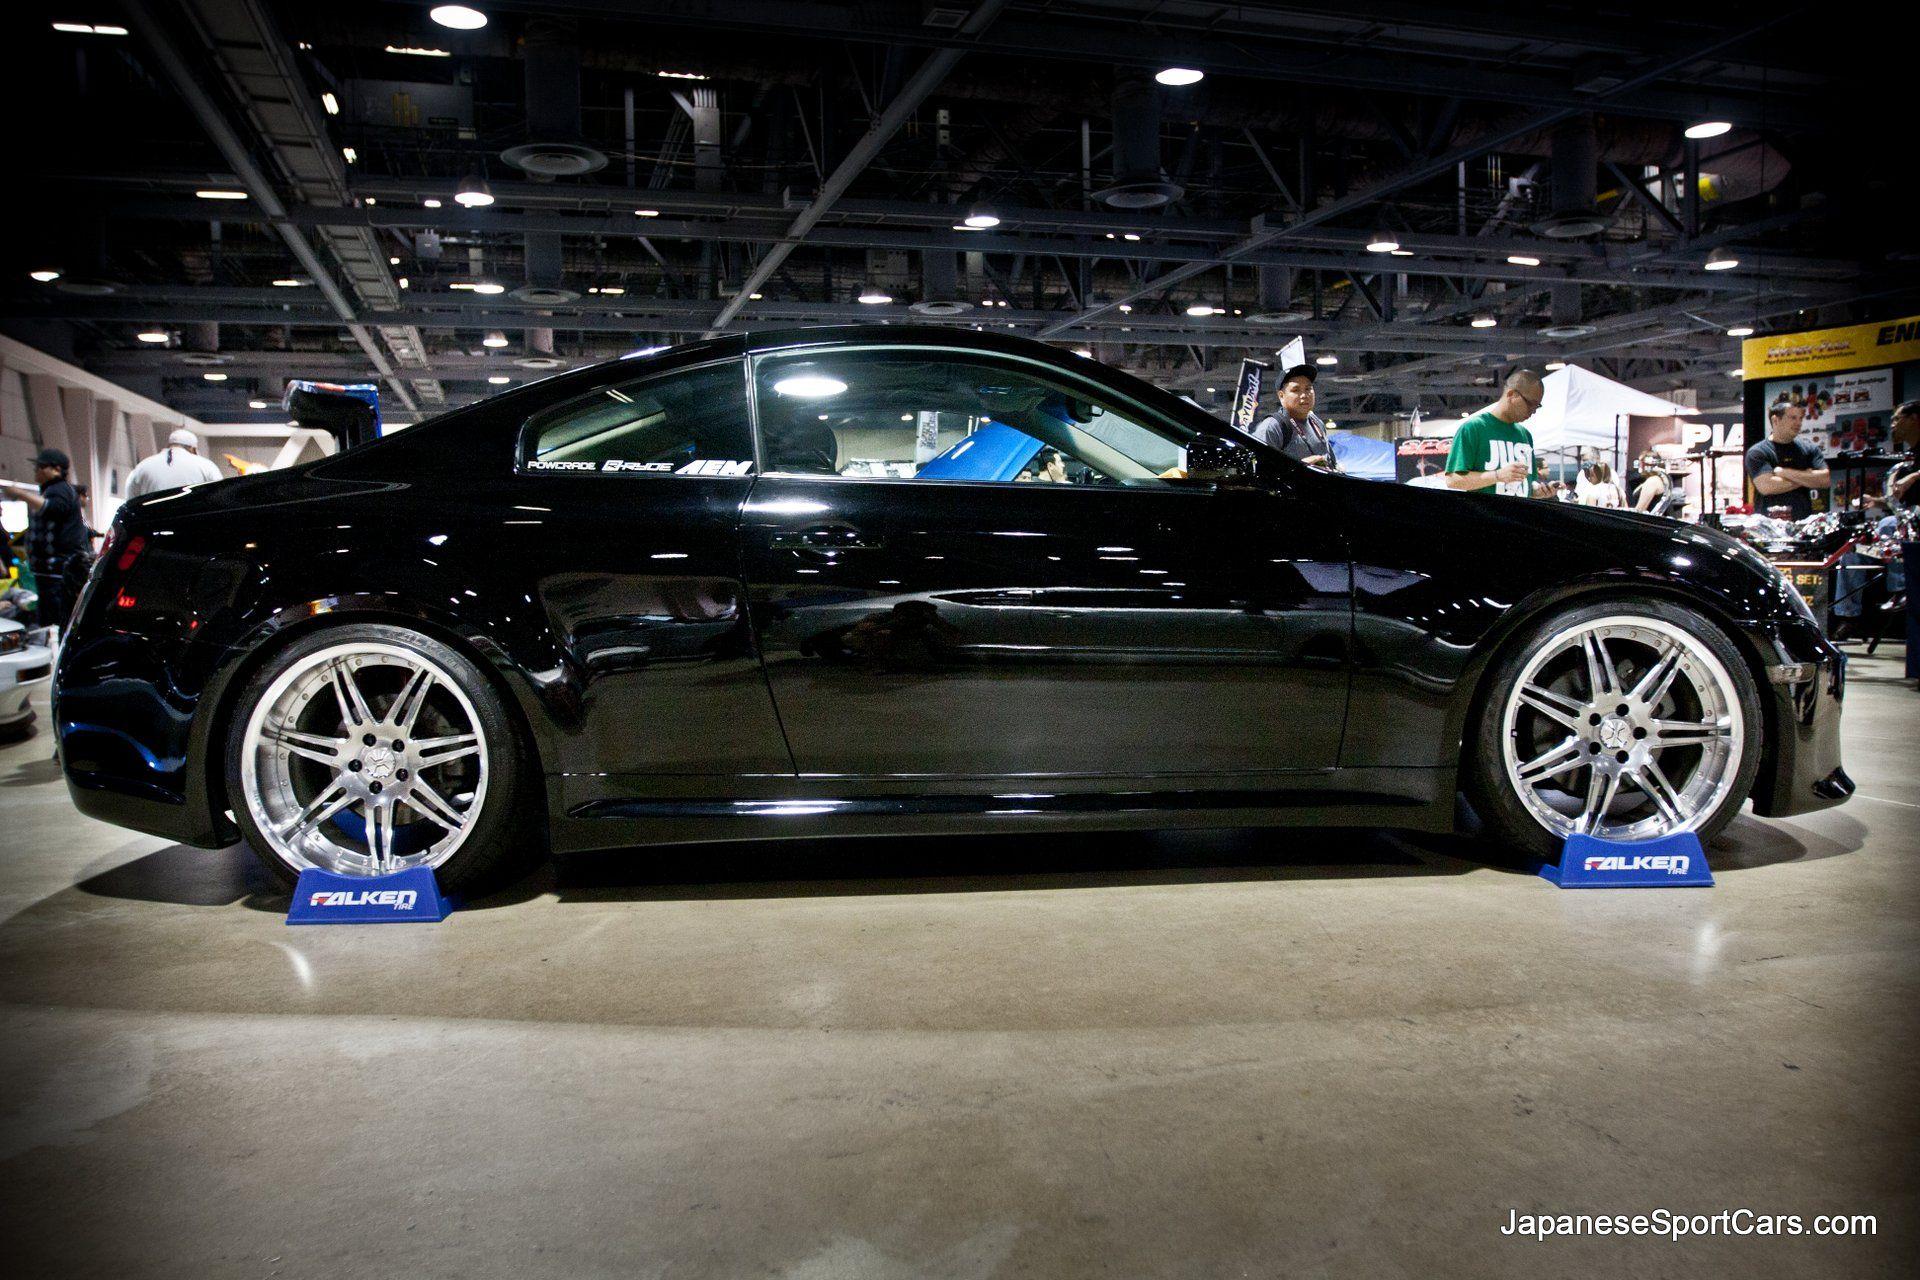 2007 Black Custom Infiniti G35 Coupe With Venaci Gs5 Wheels